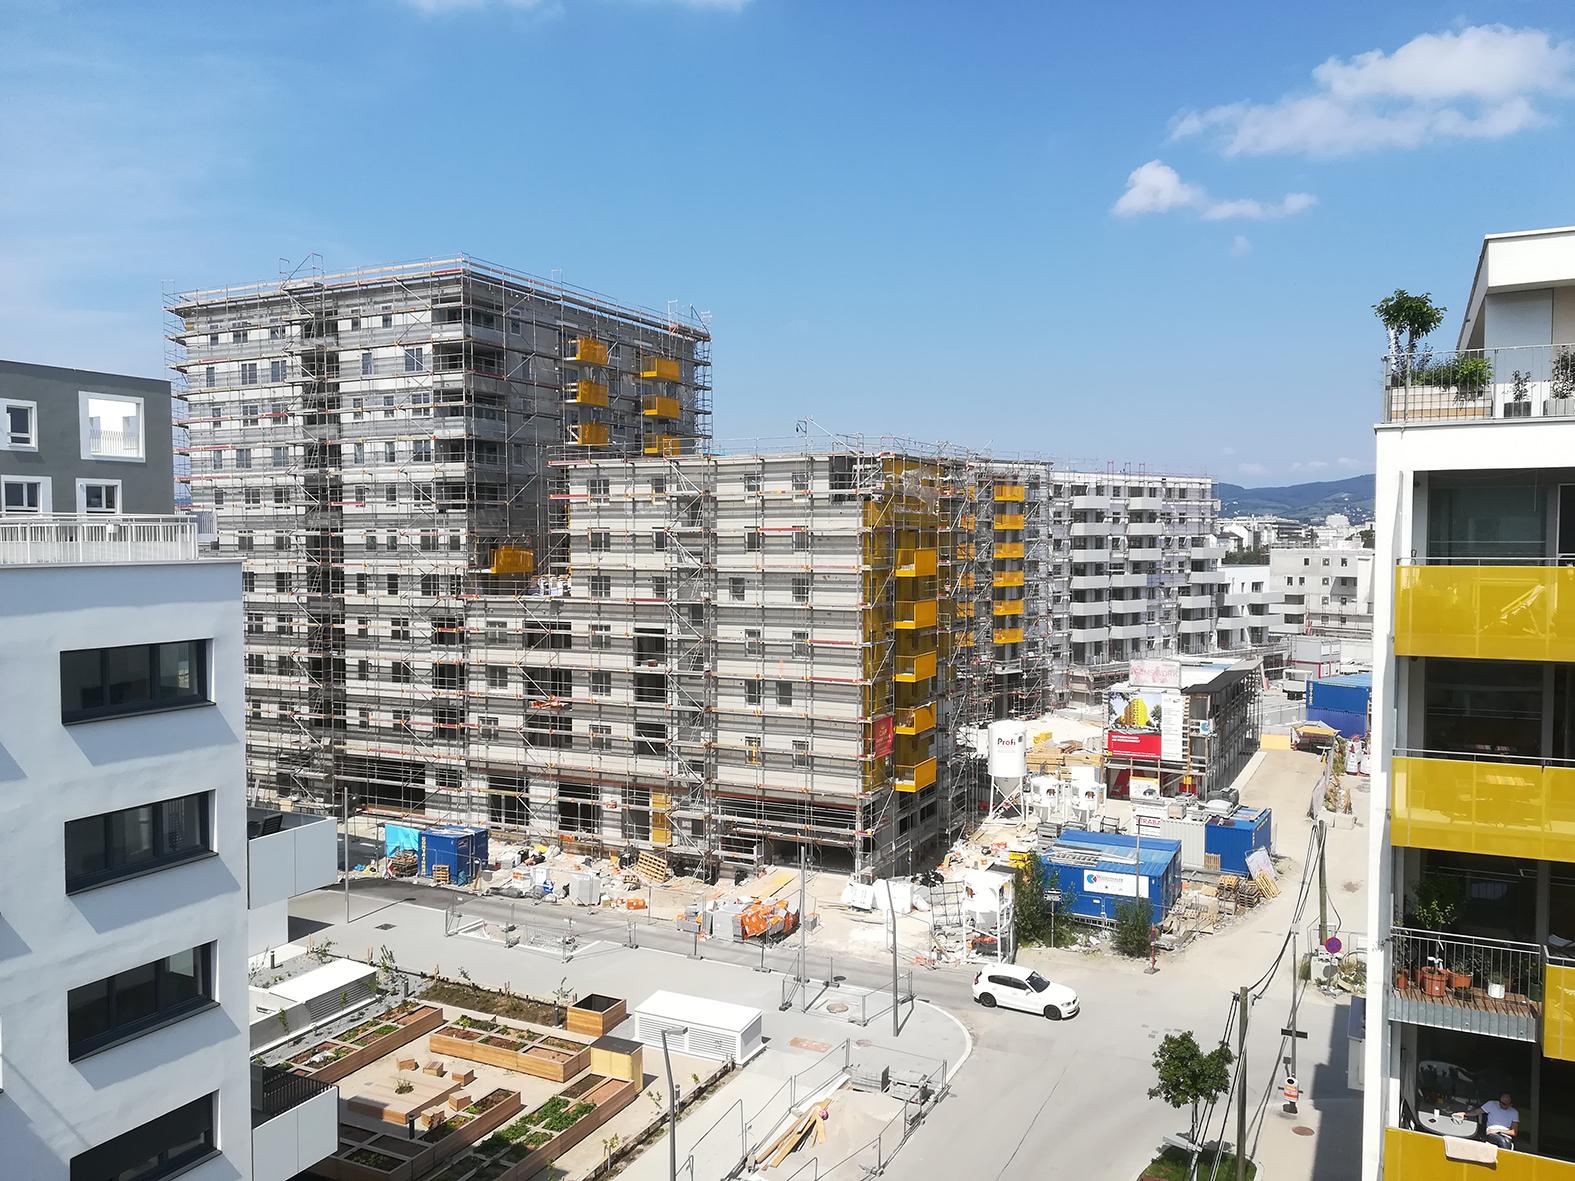 Baustelle_Juni19